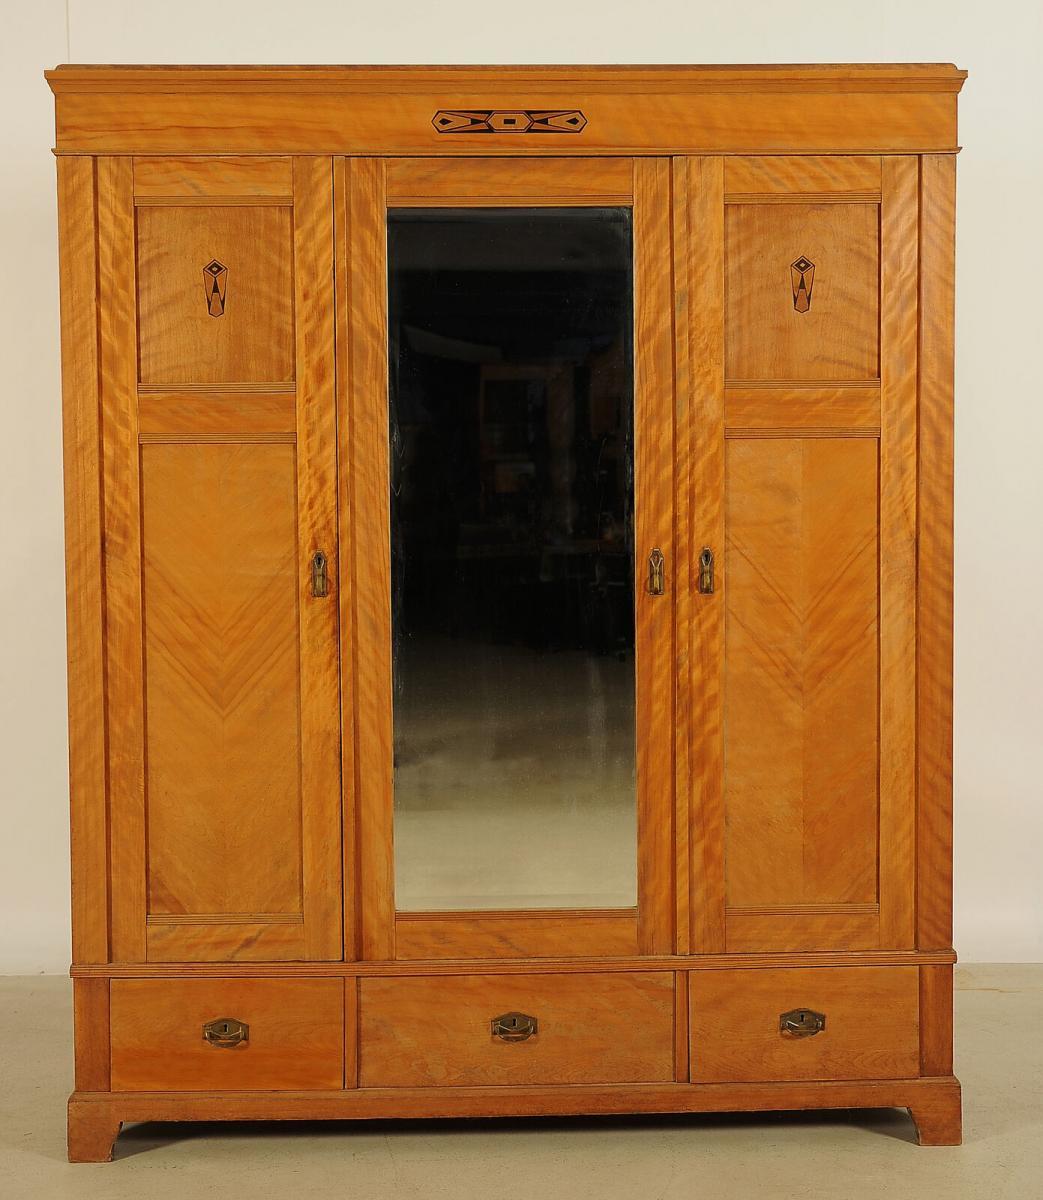 Schöner Jugendstil Kleiderschrank aus geflammter Birke Antik Kolosseum 0